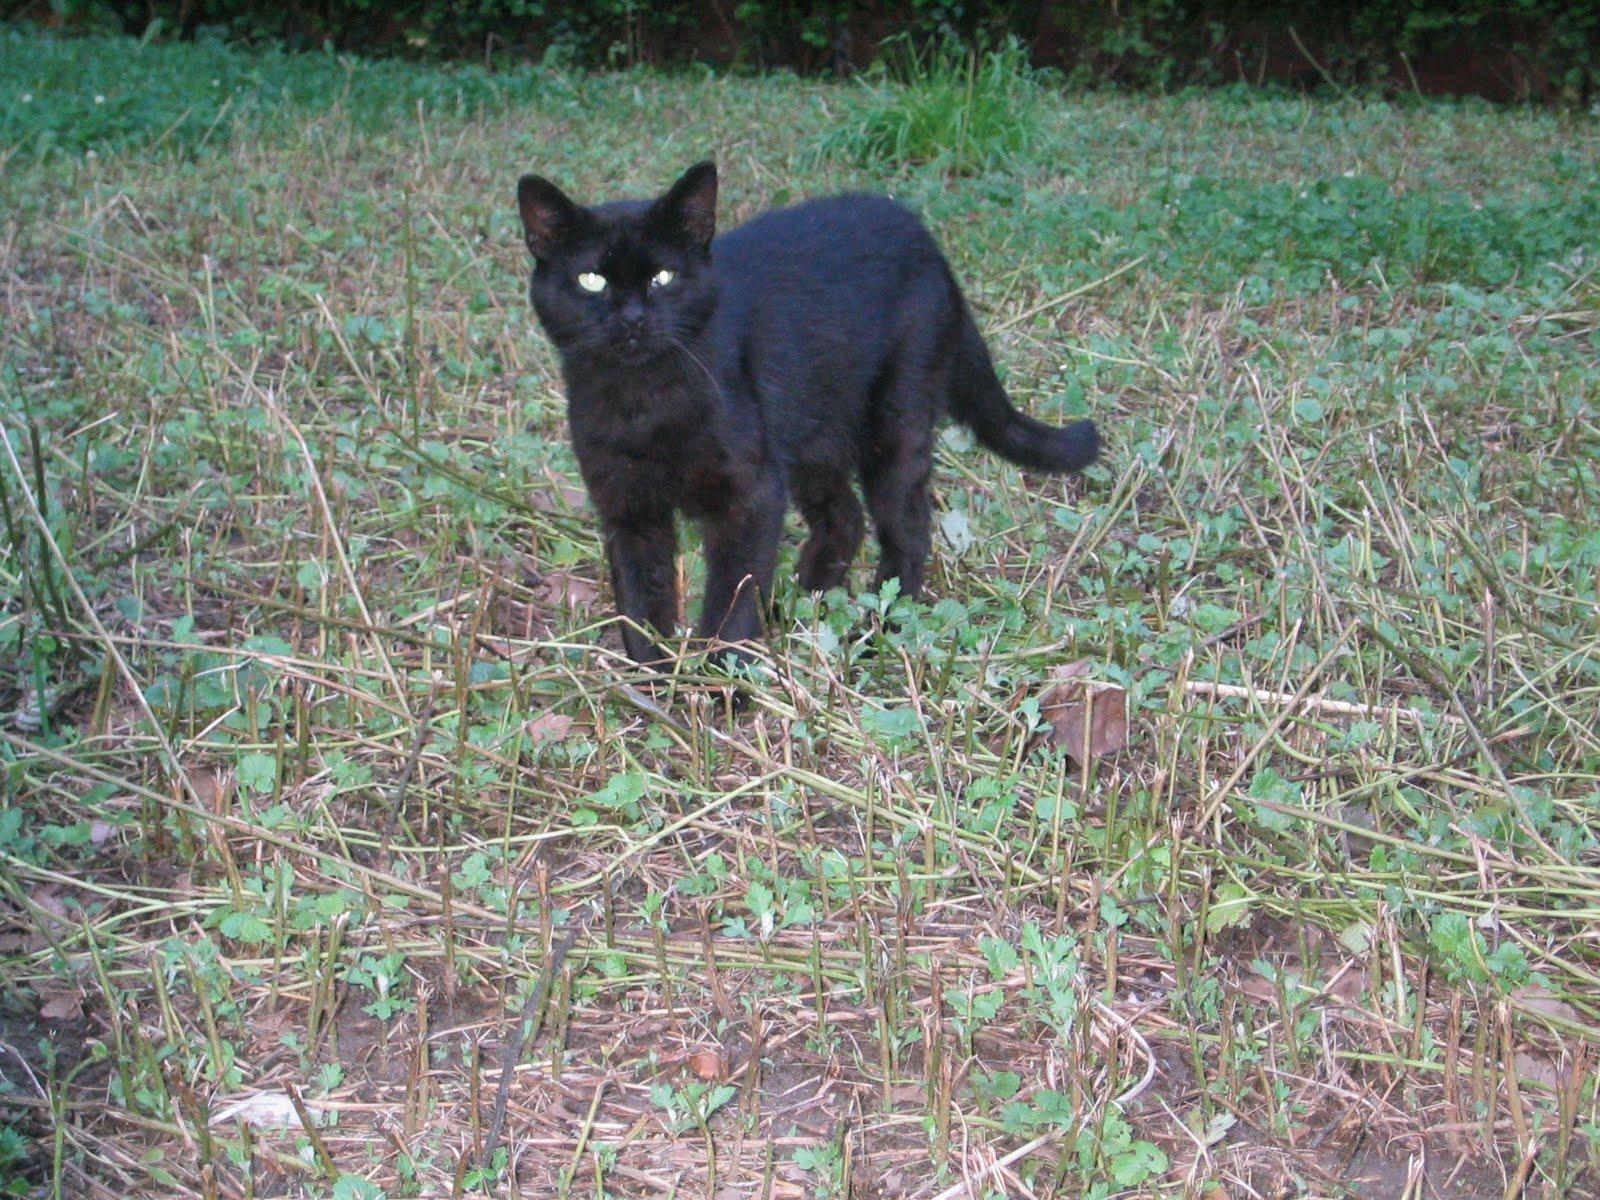 http://3.bp.blogspot.com/-RctS-YeAoDk/TfGUV96YHRI/AAAAAAAAAdQ/66BetszUiJo/s1600/black+cat2.jpg